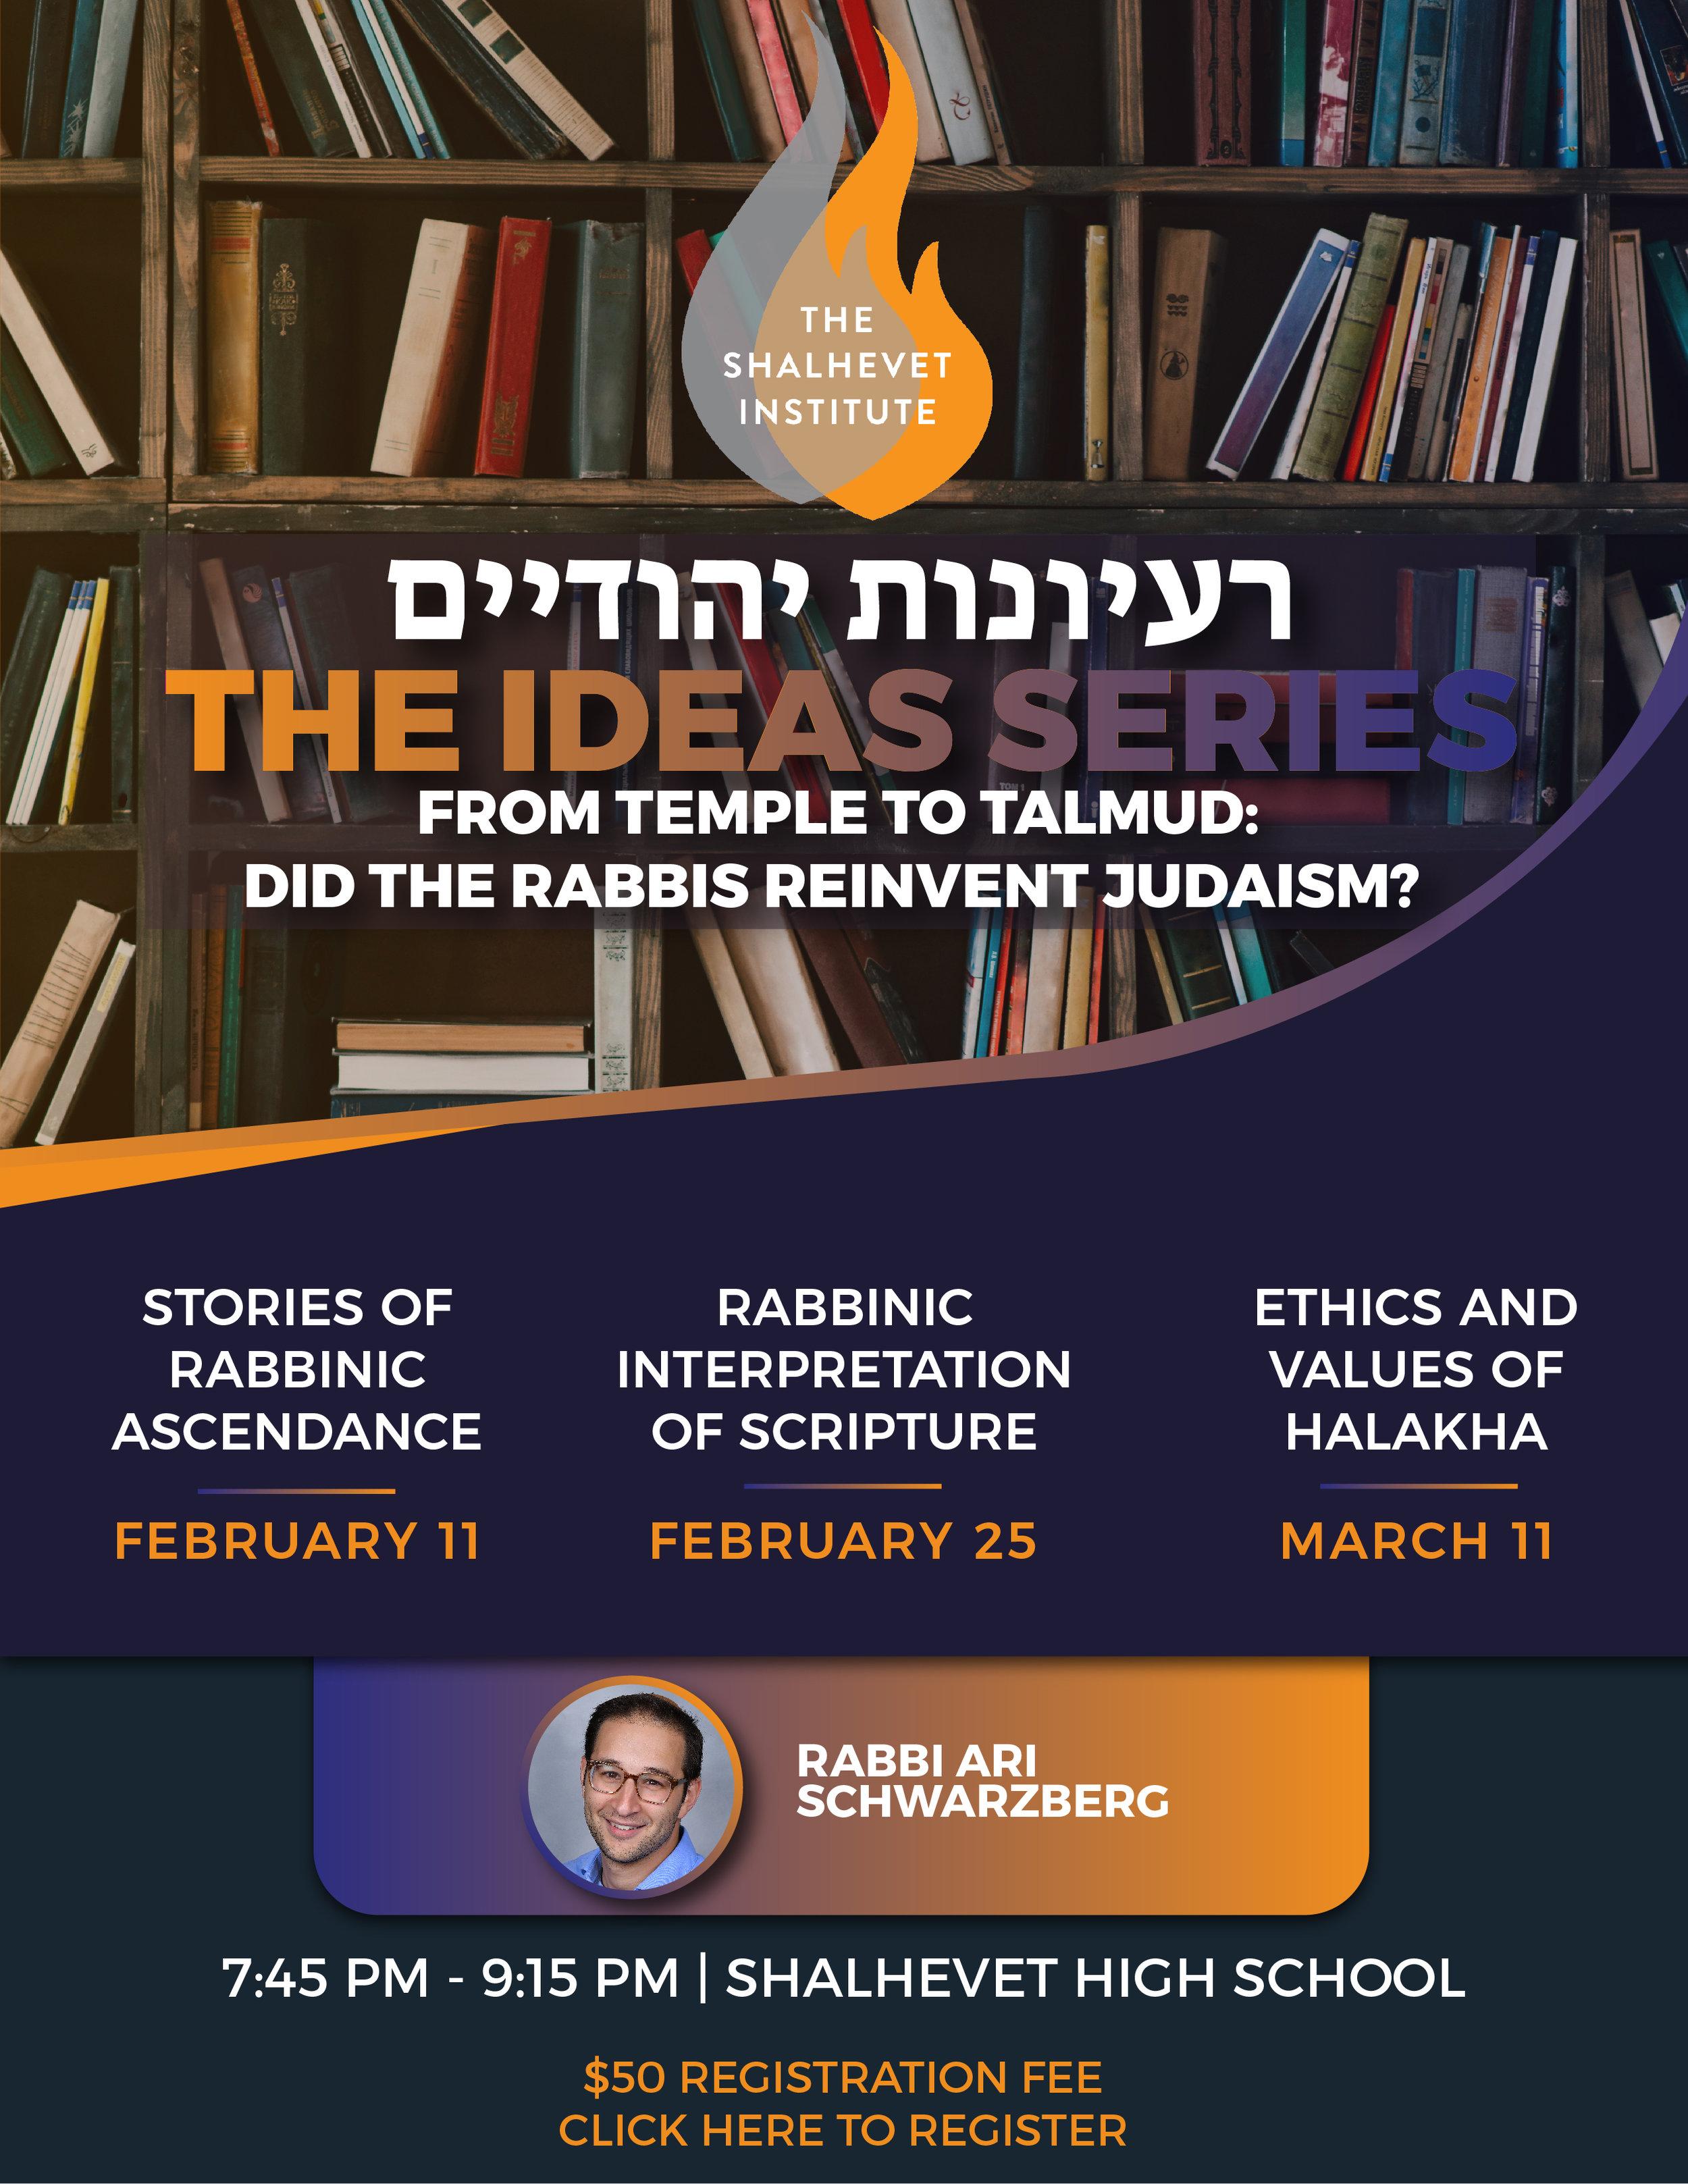 The Ideas Series - Flyer, Shalhevet Institute